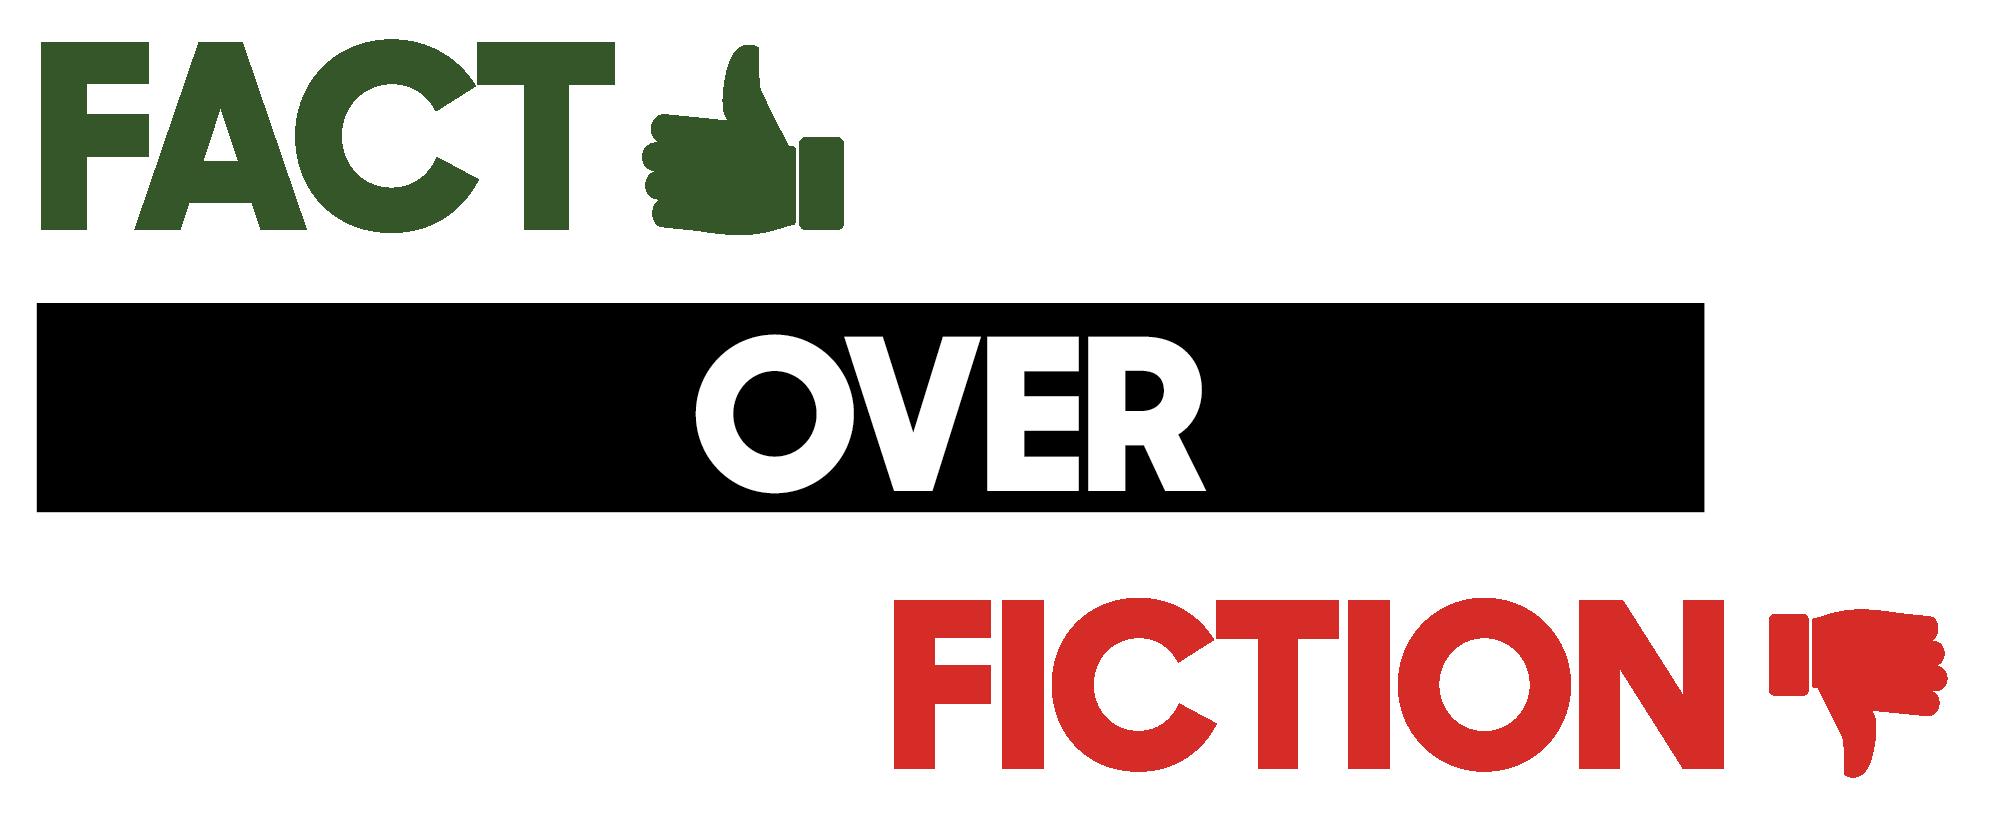 FoF logo options-05